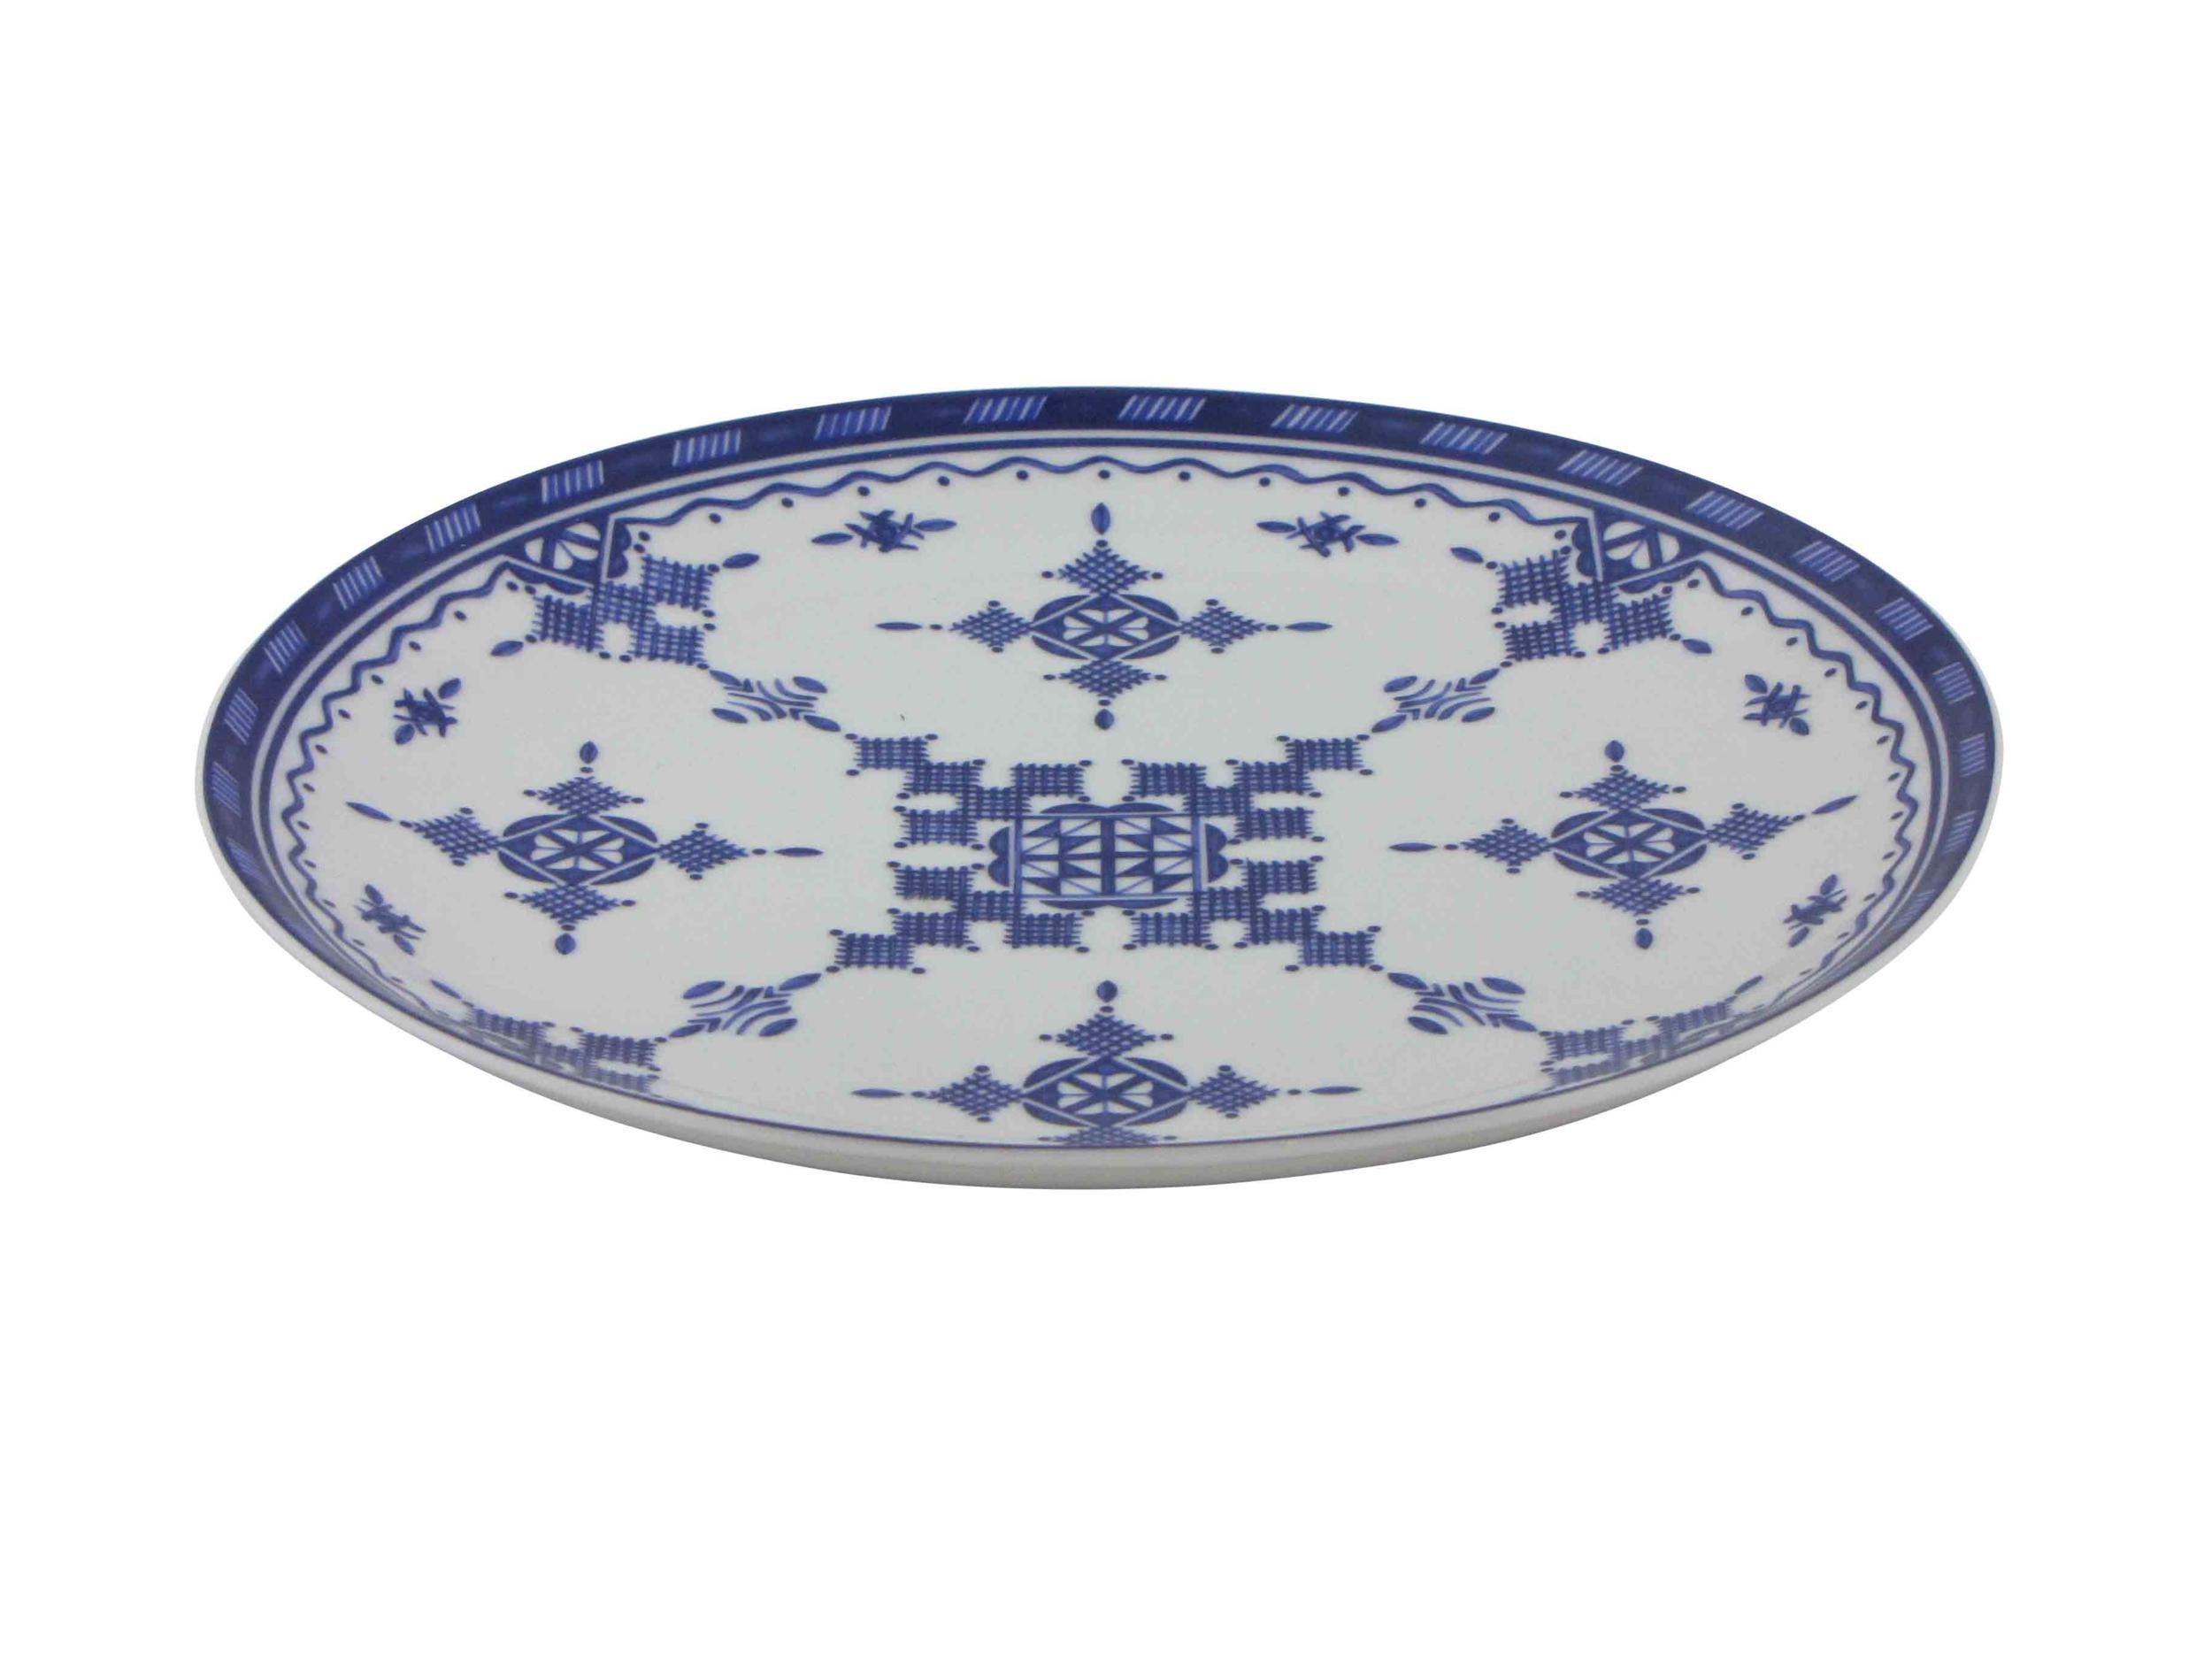 Assiette plate 26,5 cm Point Bleu